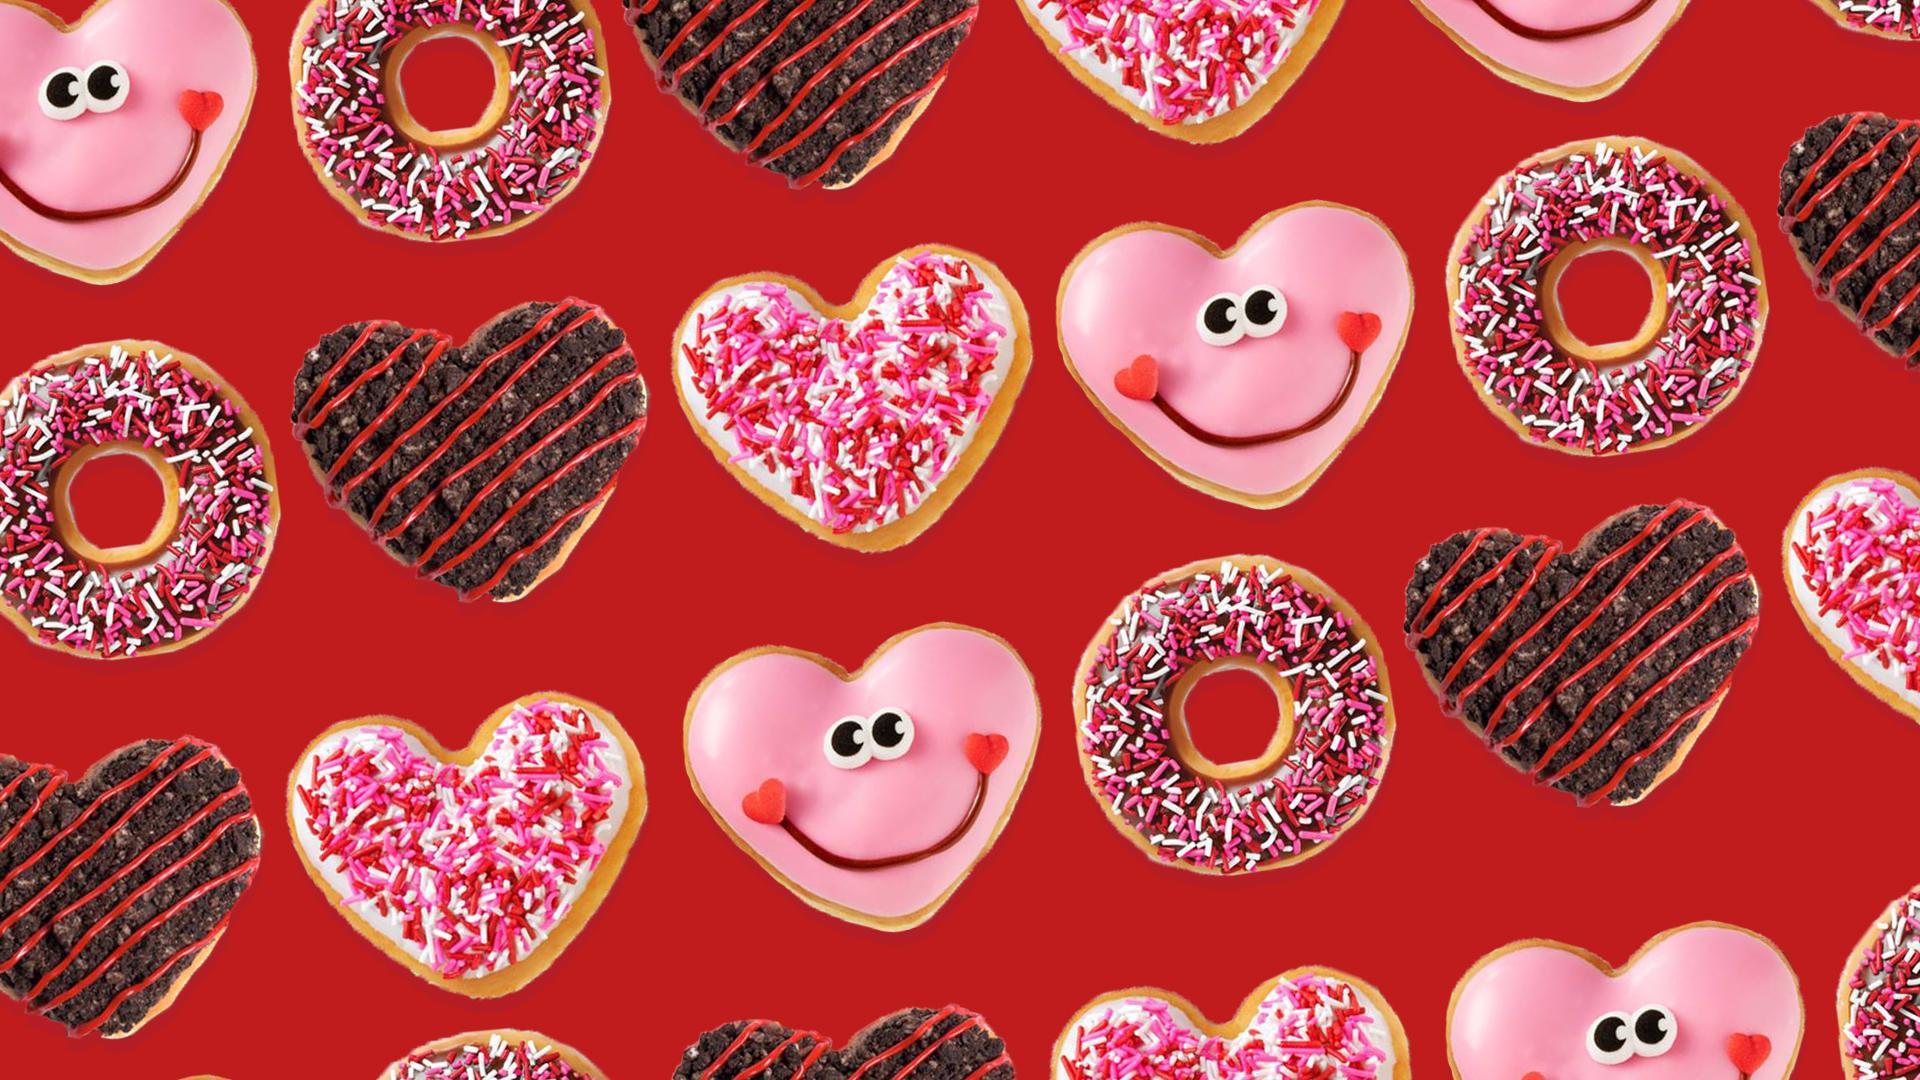 Dominoes Falling Wallpaper People Are Falling For Krispy Kreme S New Heart Shaped